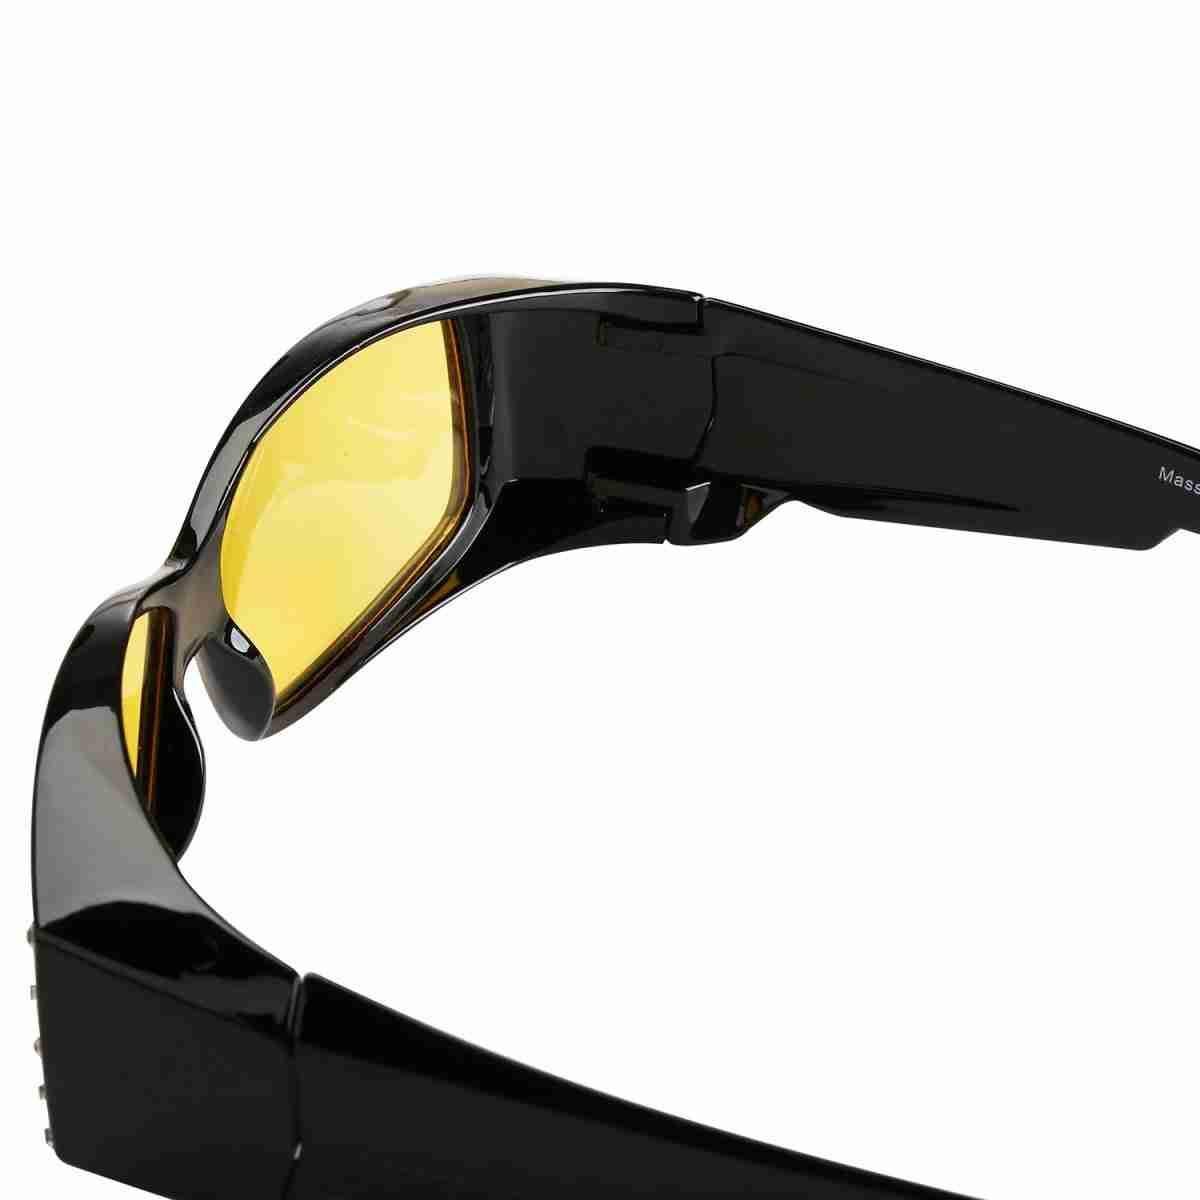 Mass-Vision-Eyewear-Rhinestone-Fit-Over-Sunglasses-Night-Lens-Black-Inside